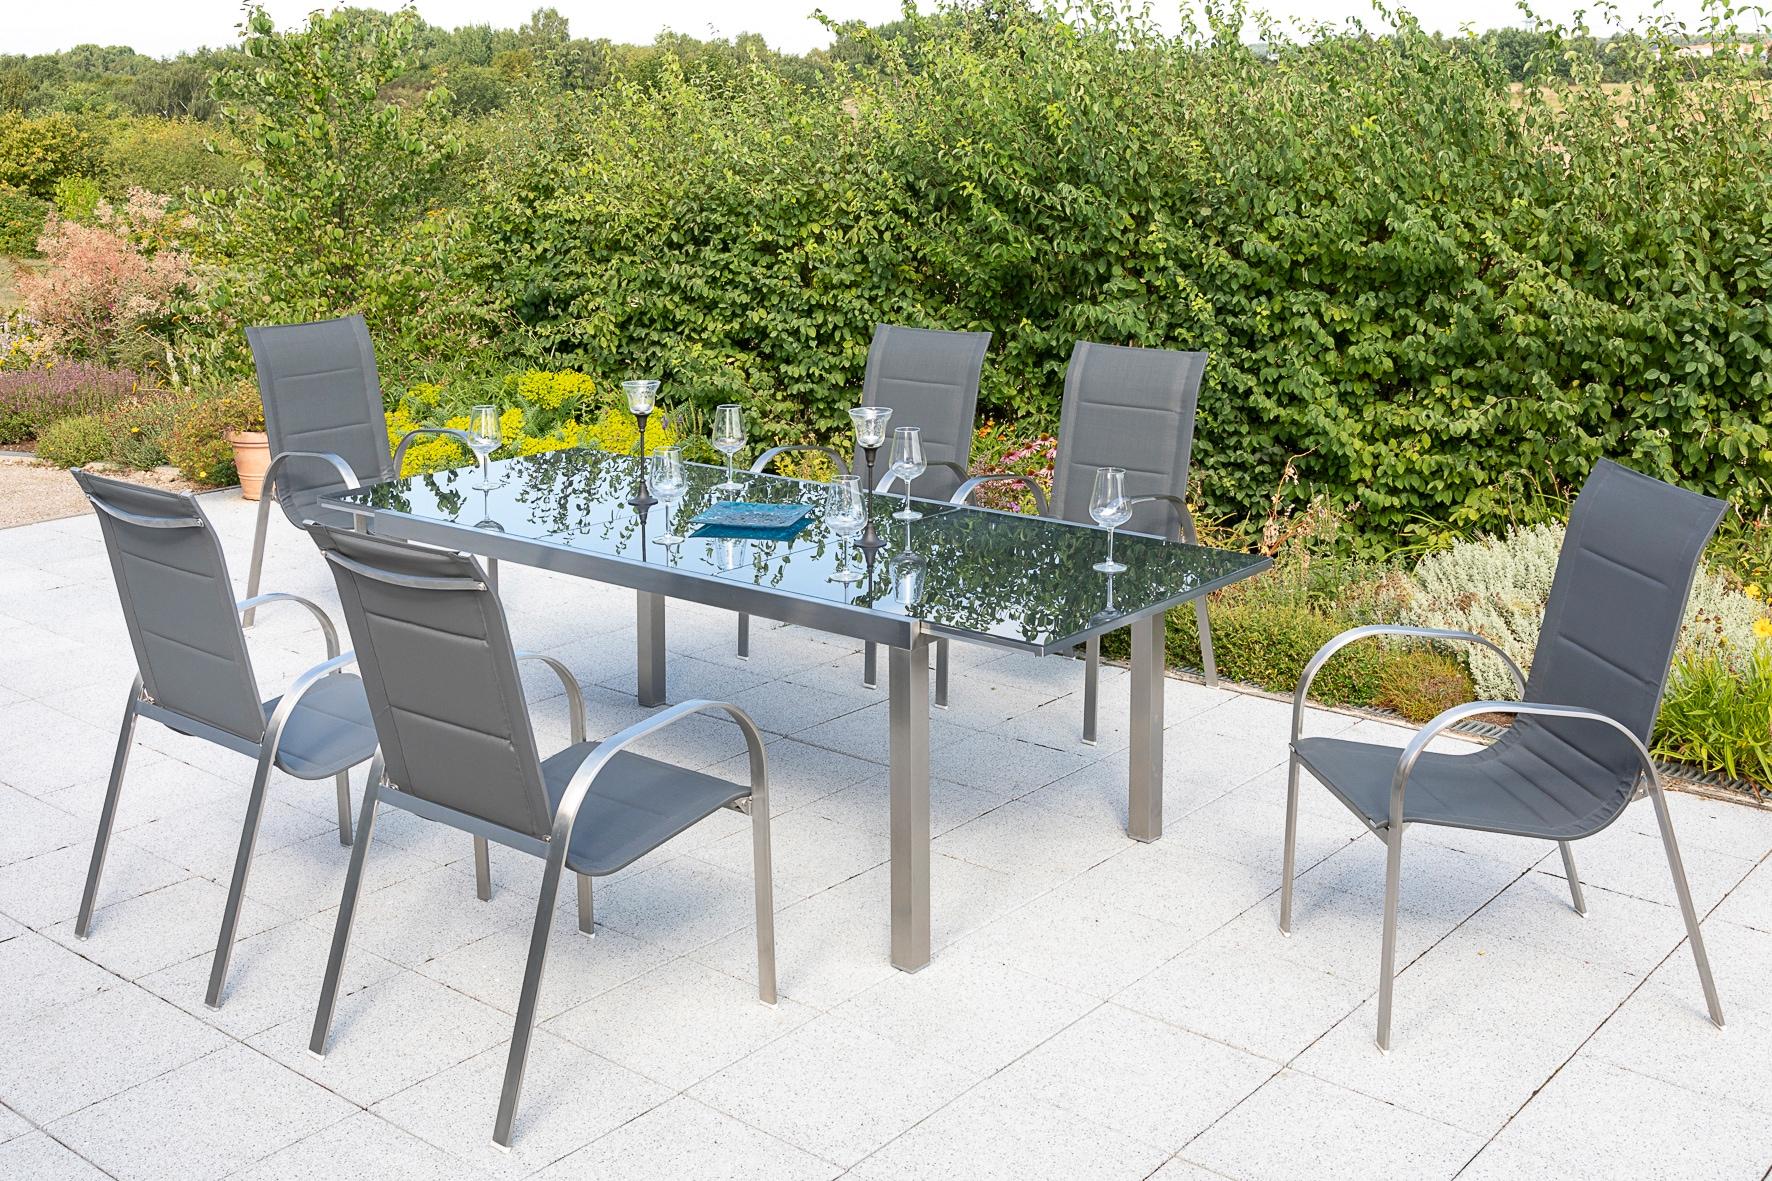 MERXX Gartenmöbelset Lucca 7-tlg 6 Sessel Tisch 180 (240)x100 cm Edelstahl/Textil